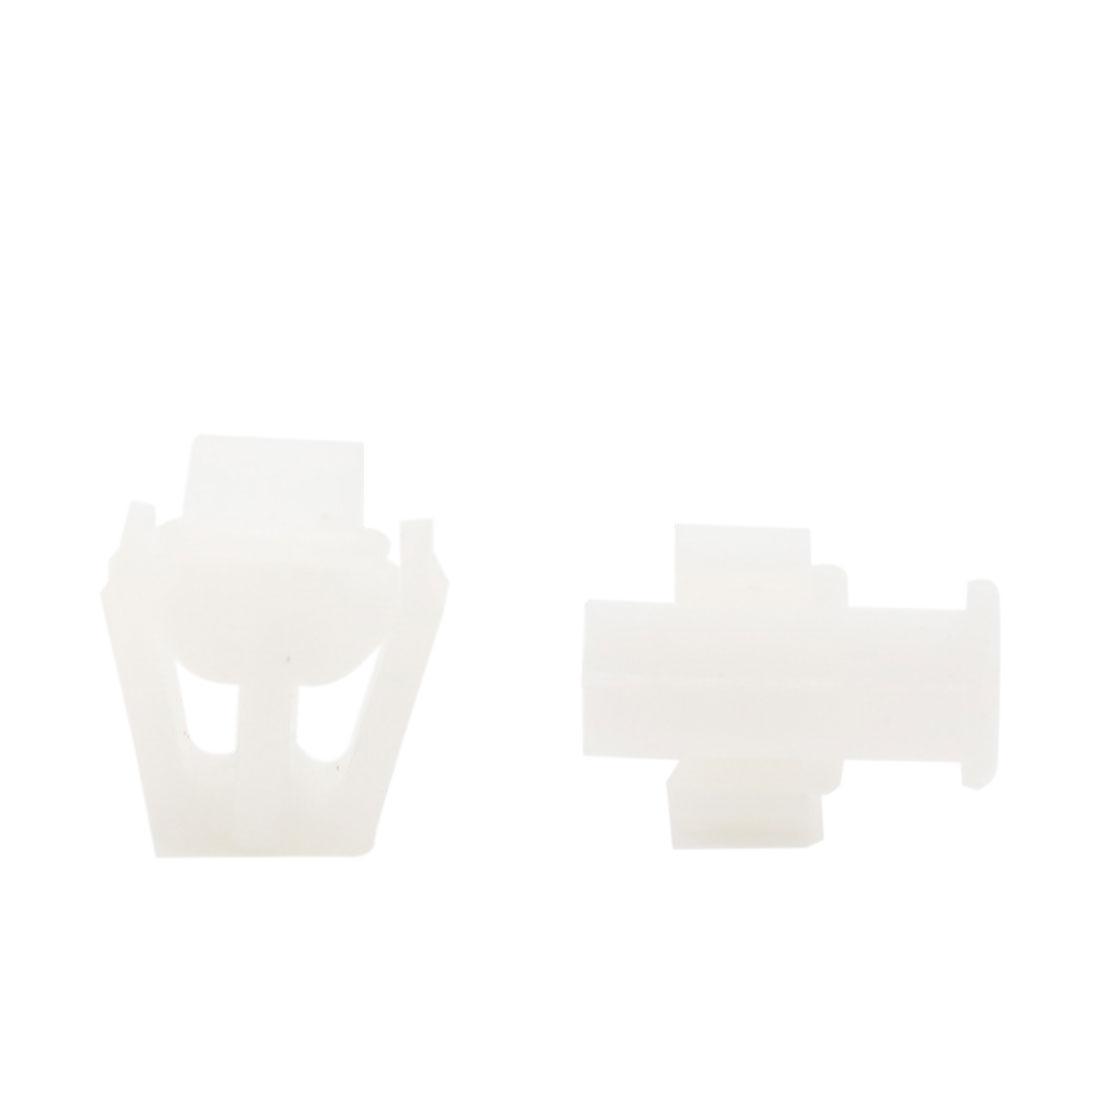 50 Pcs White Plastic Rivet Trim Fastener Moulding Clips Fit for 12mm Dia Hole